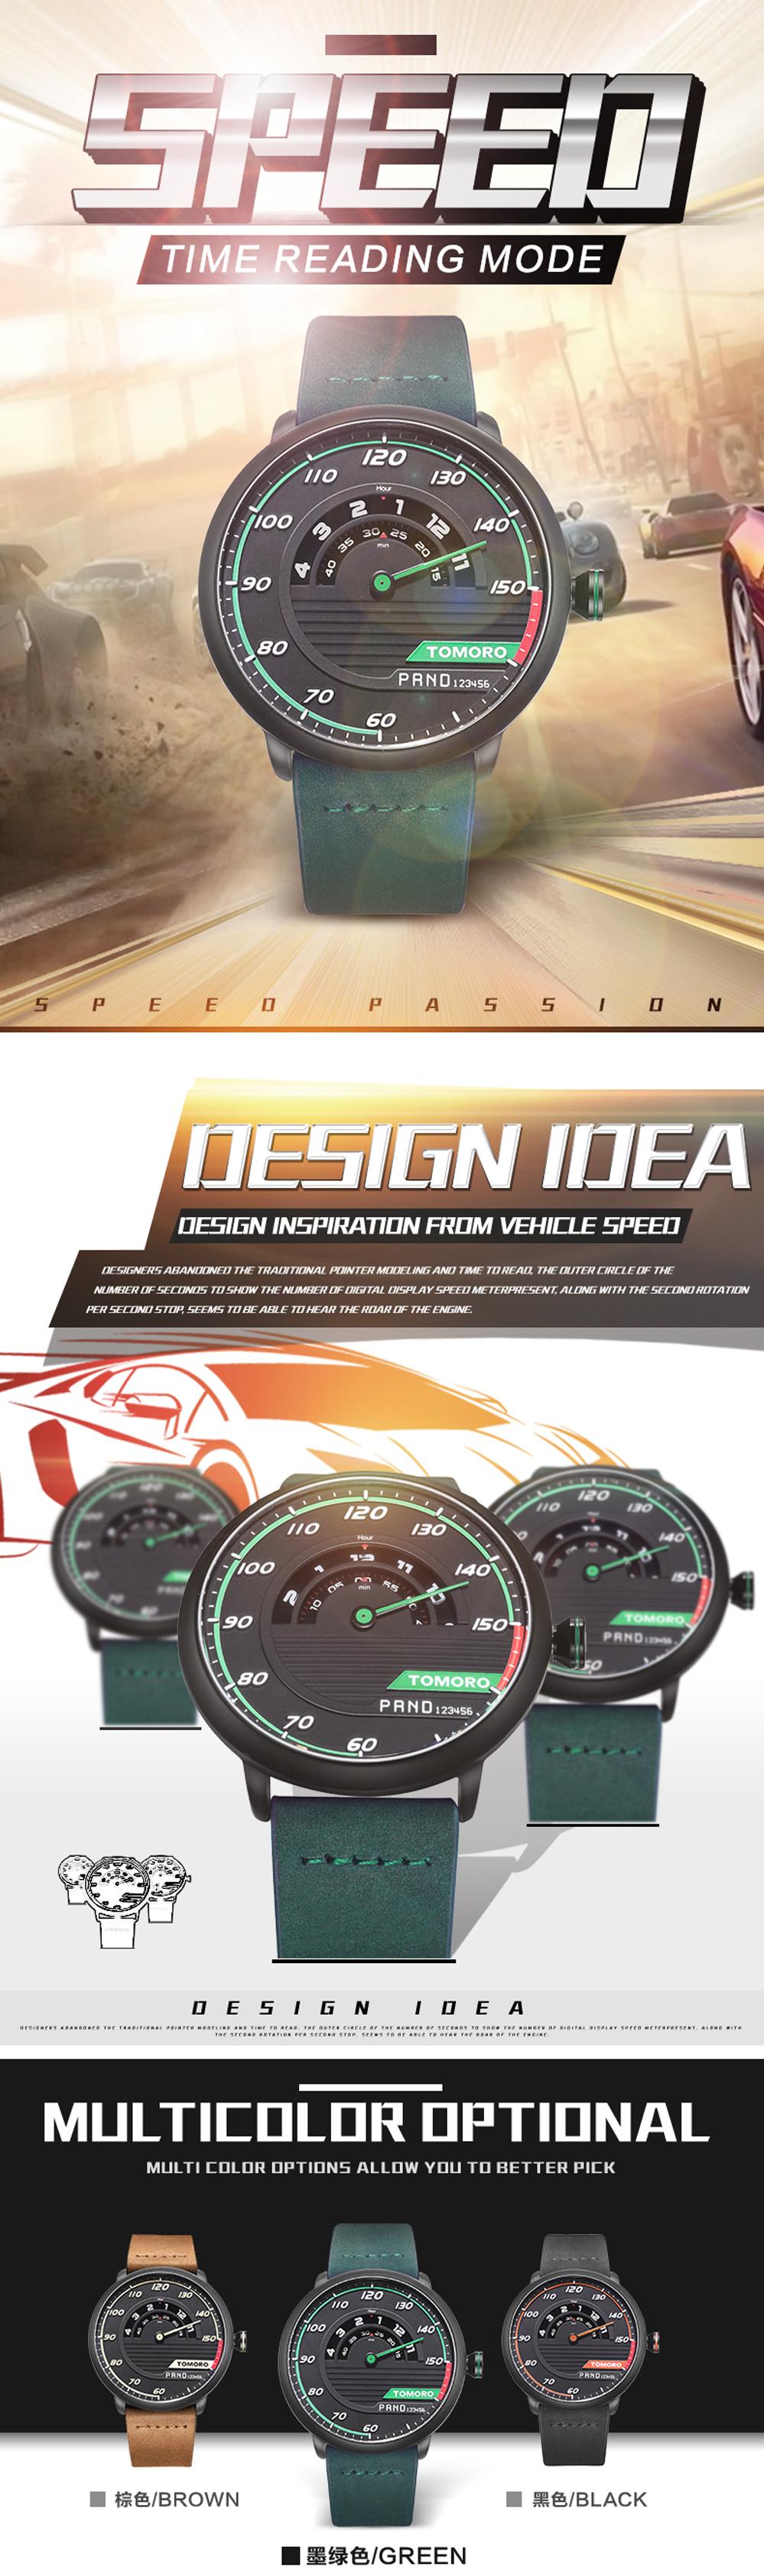 HTB1unZ3QFXXXXc6XVXXq6xXFXXXY TOMORO Men's Unique Racing Car 3D Design Wrist Watch